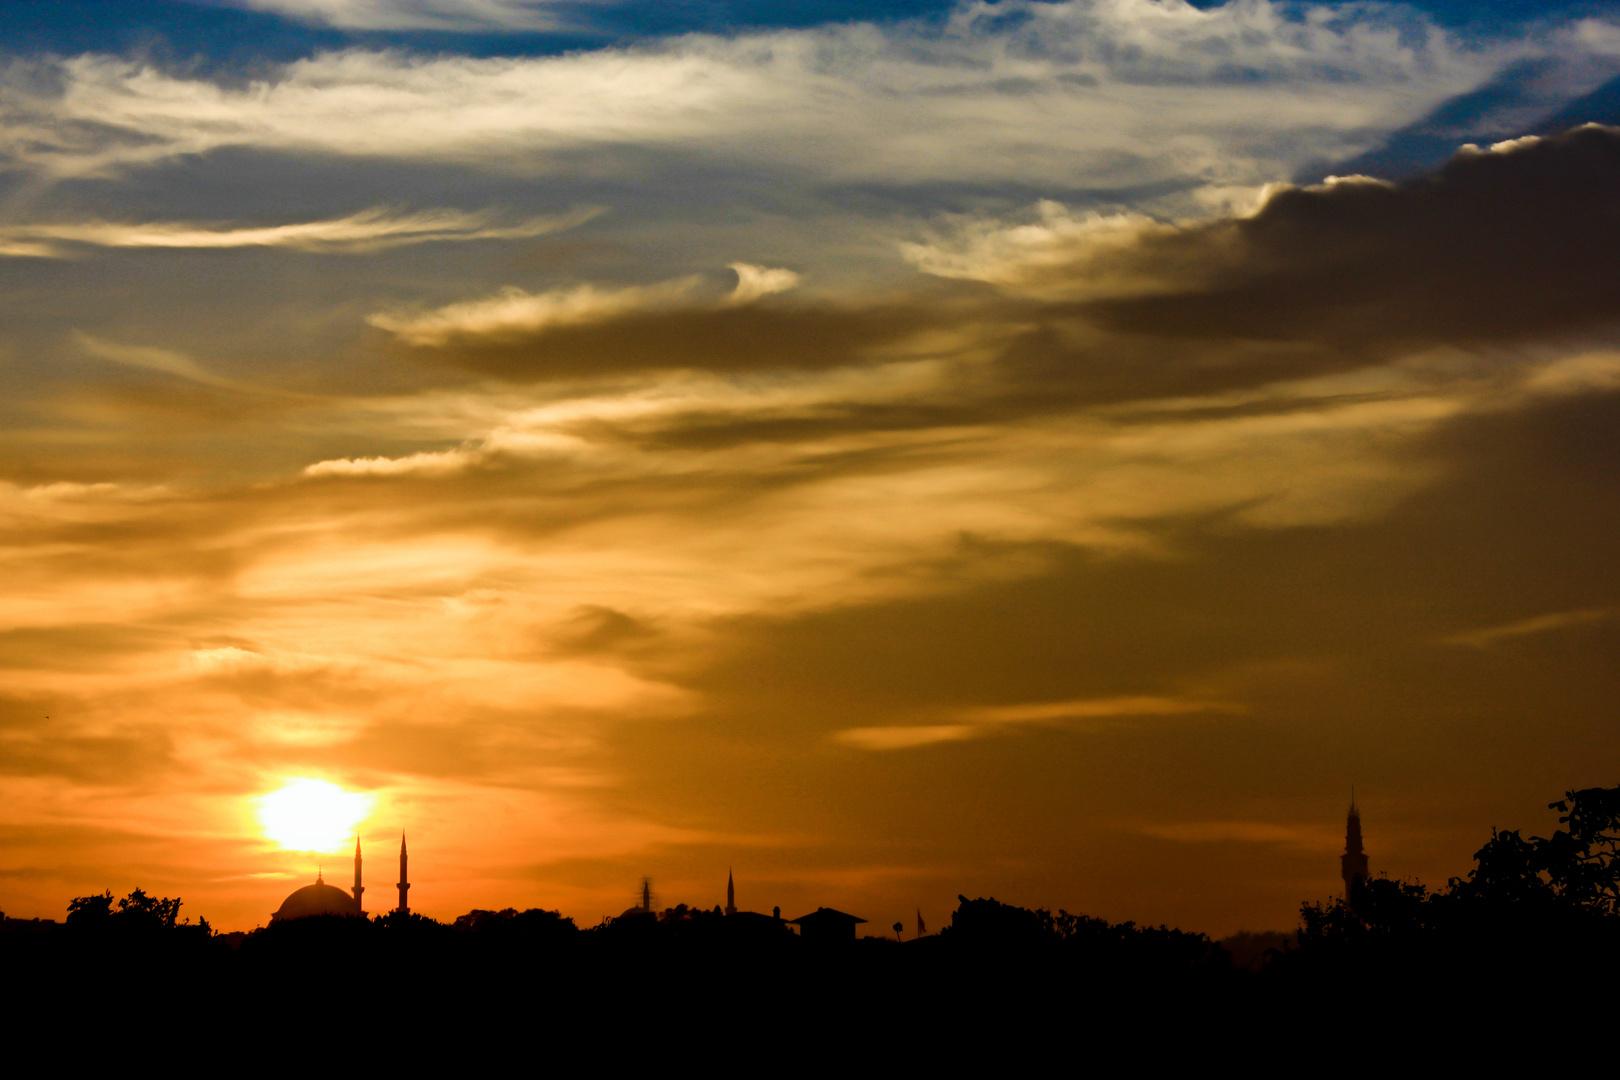 Istanbul am Abend vom Topkapi Palace